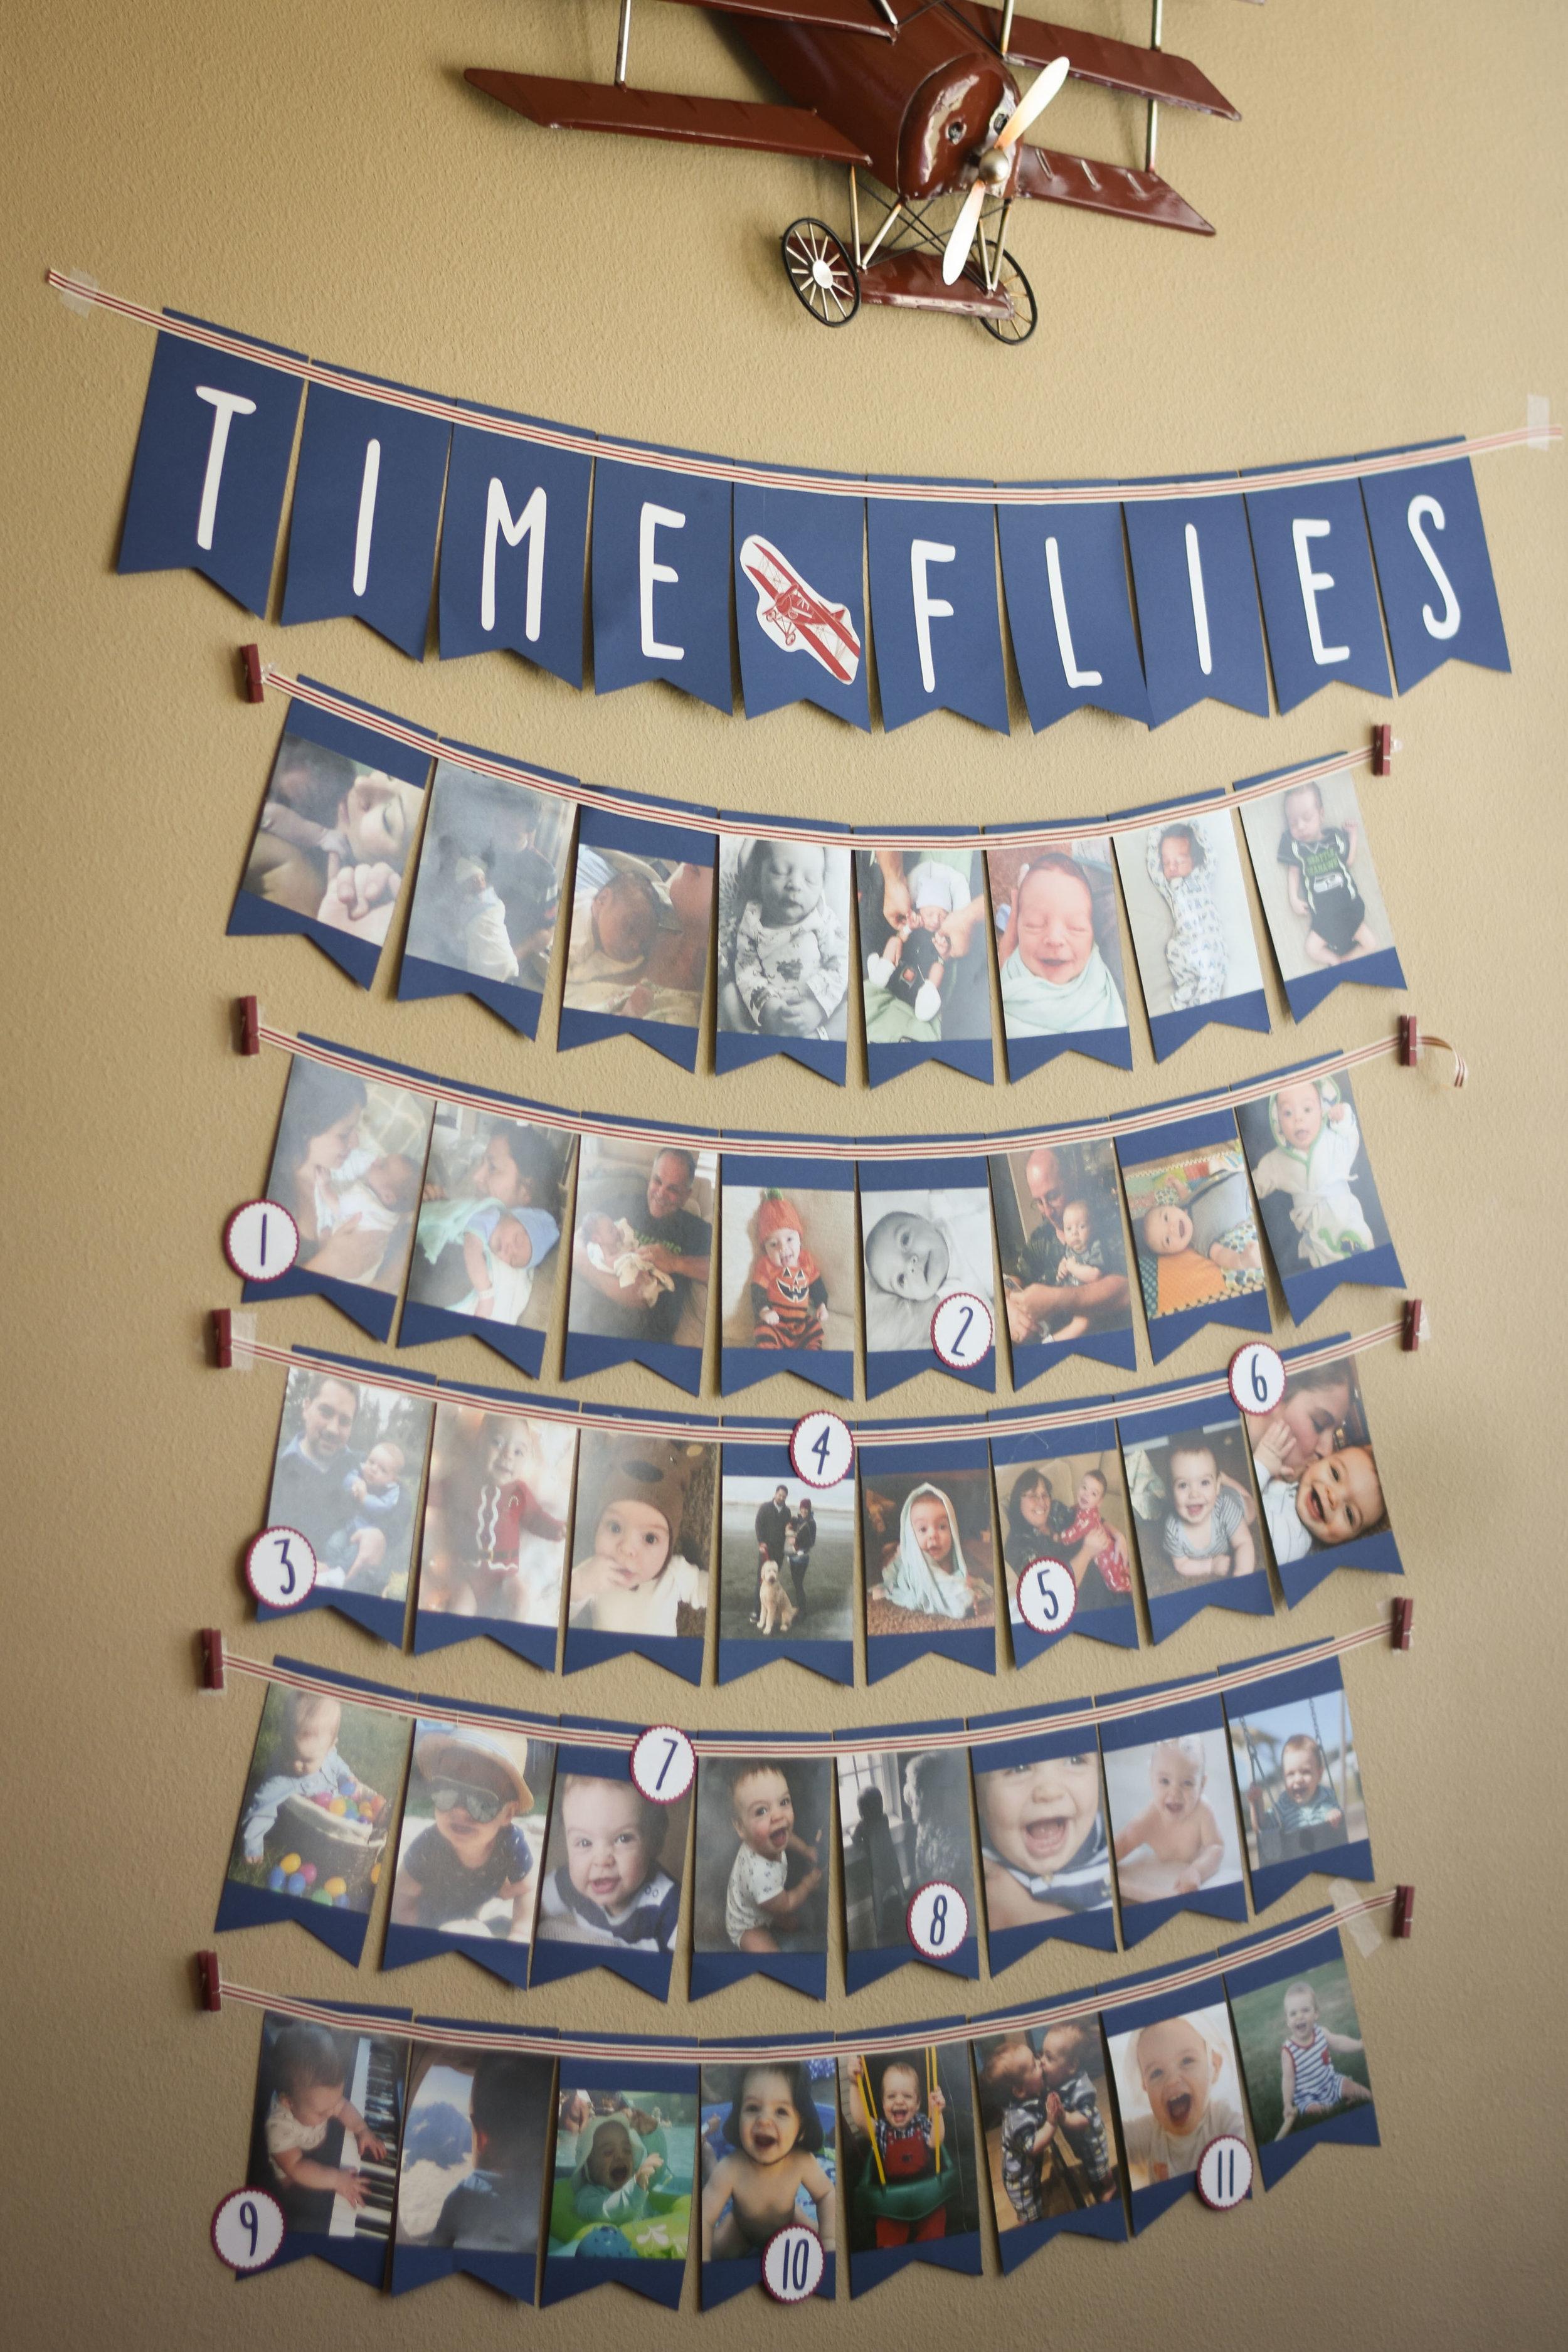 time-flies-photo-display_